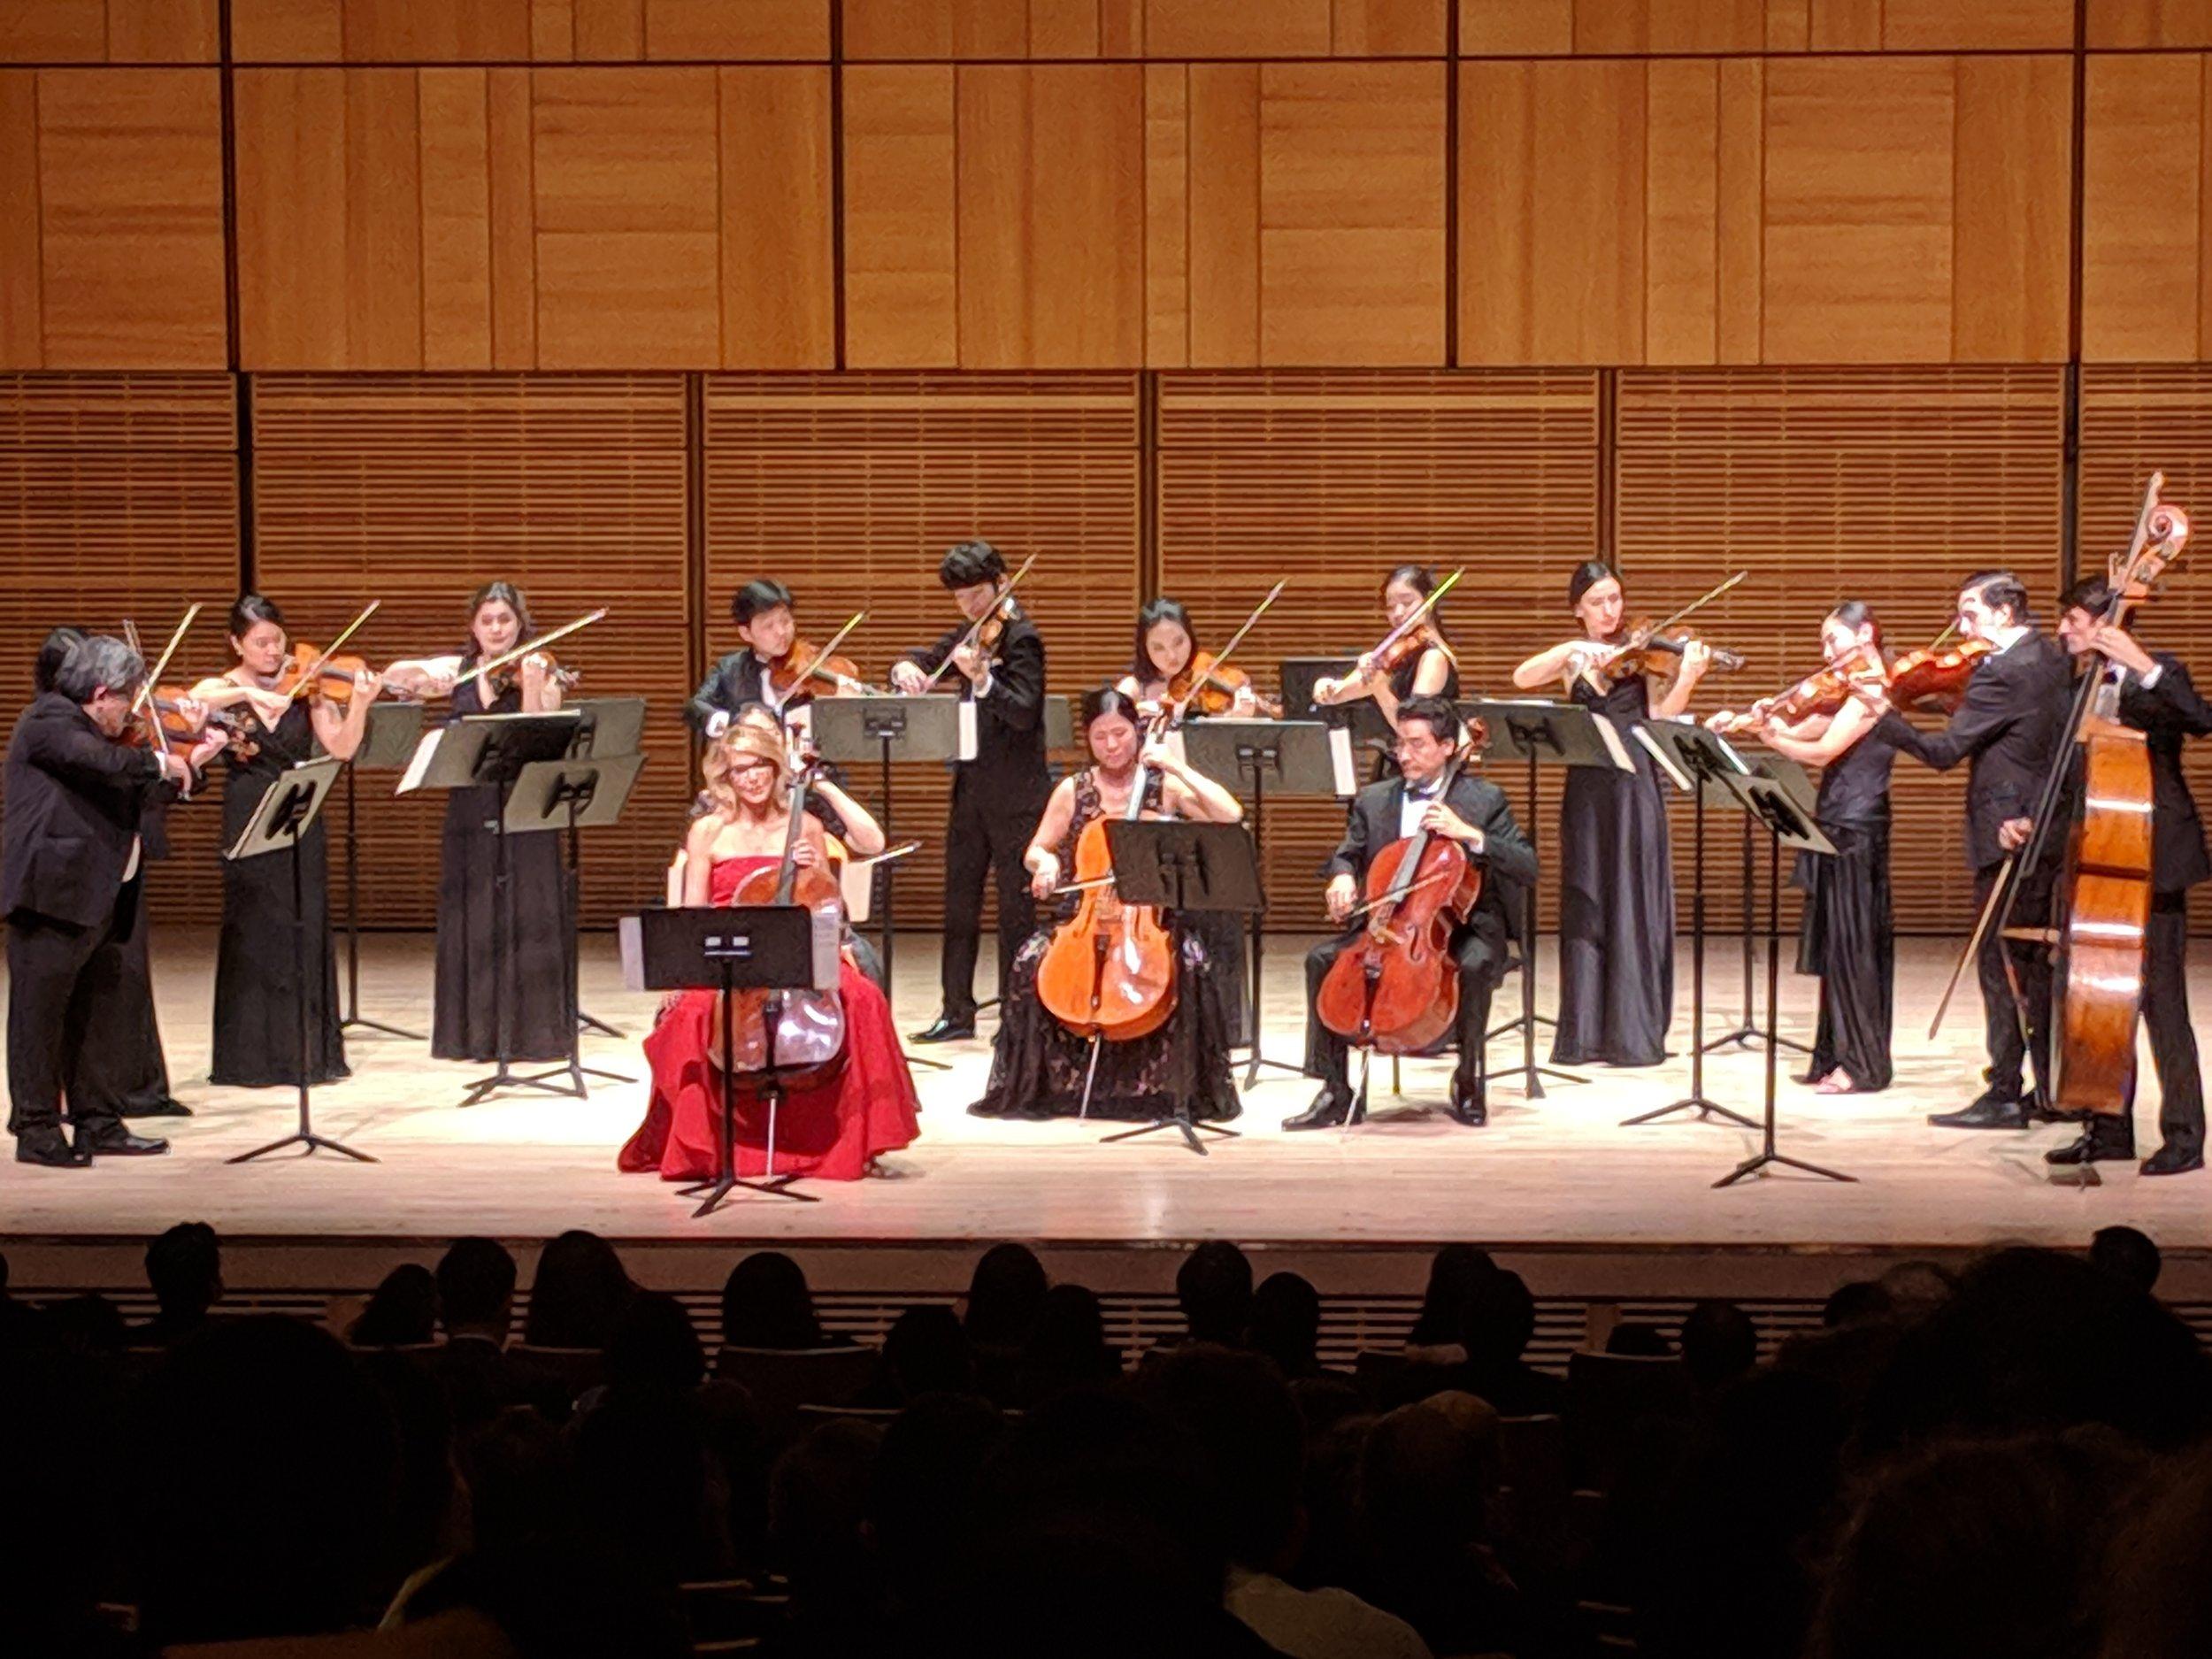 Paula Zahn plays the cello, with Sejong Soloists